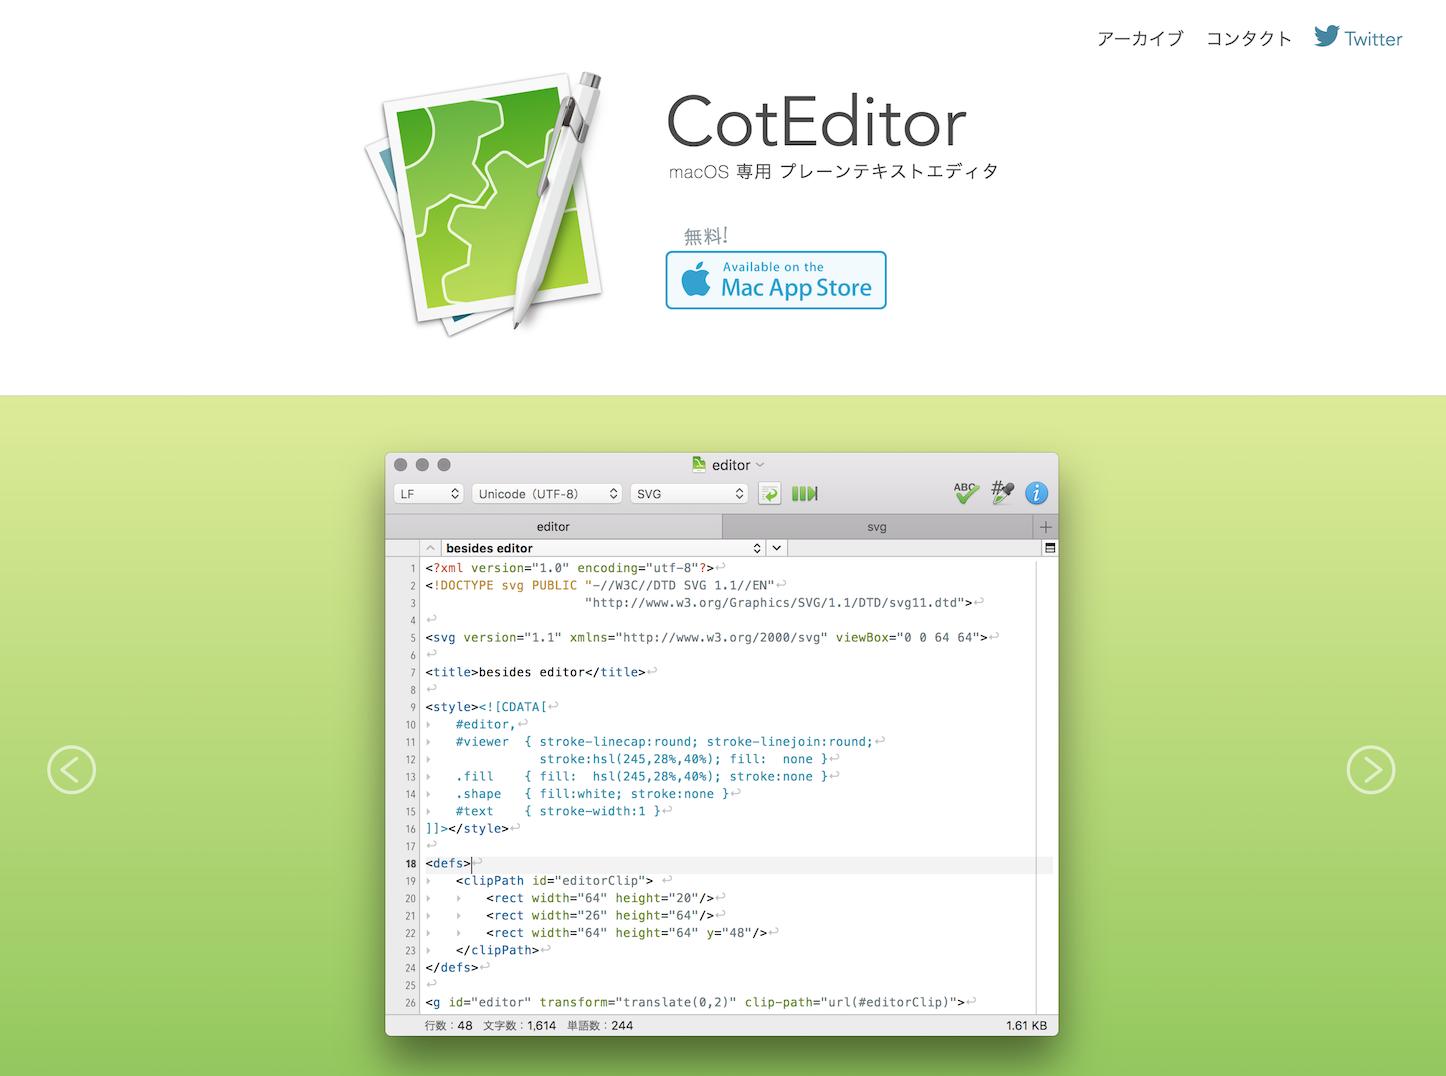 CotEditor 3